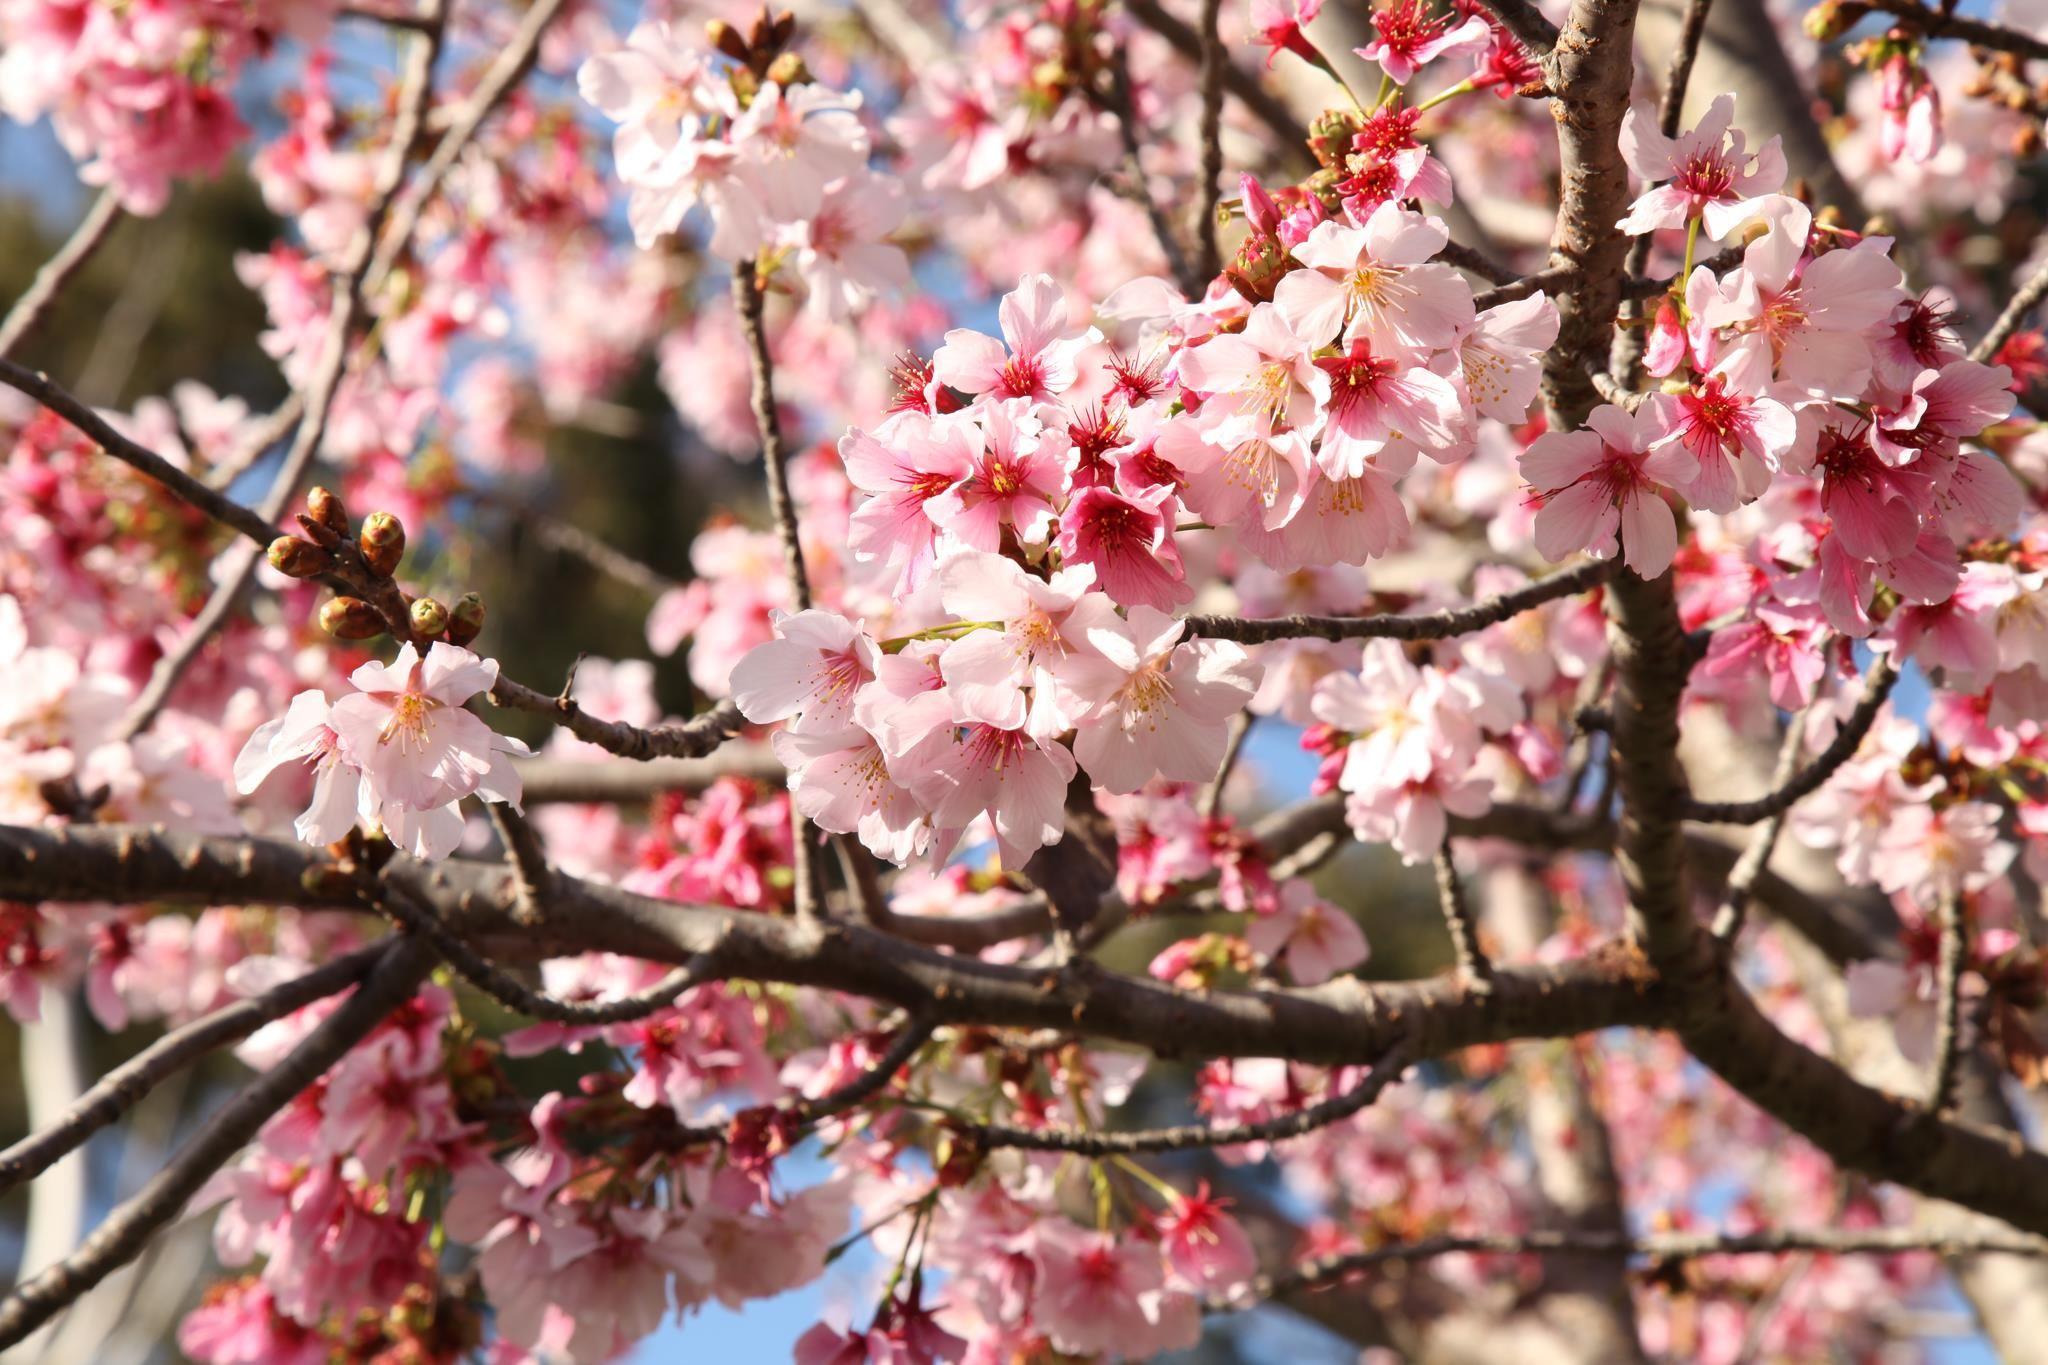 Japanese Friendship Garden San Diego Cherry Blossom Festival 2016 In San Diego Ca Everfest Cherry Blossom Festival Cherry Blooms Cherry Blossom